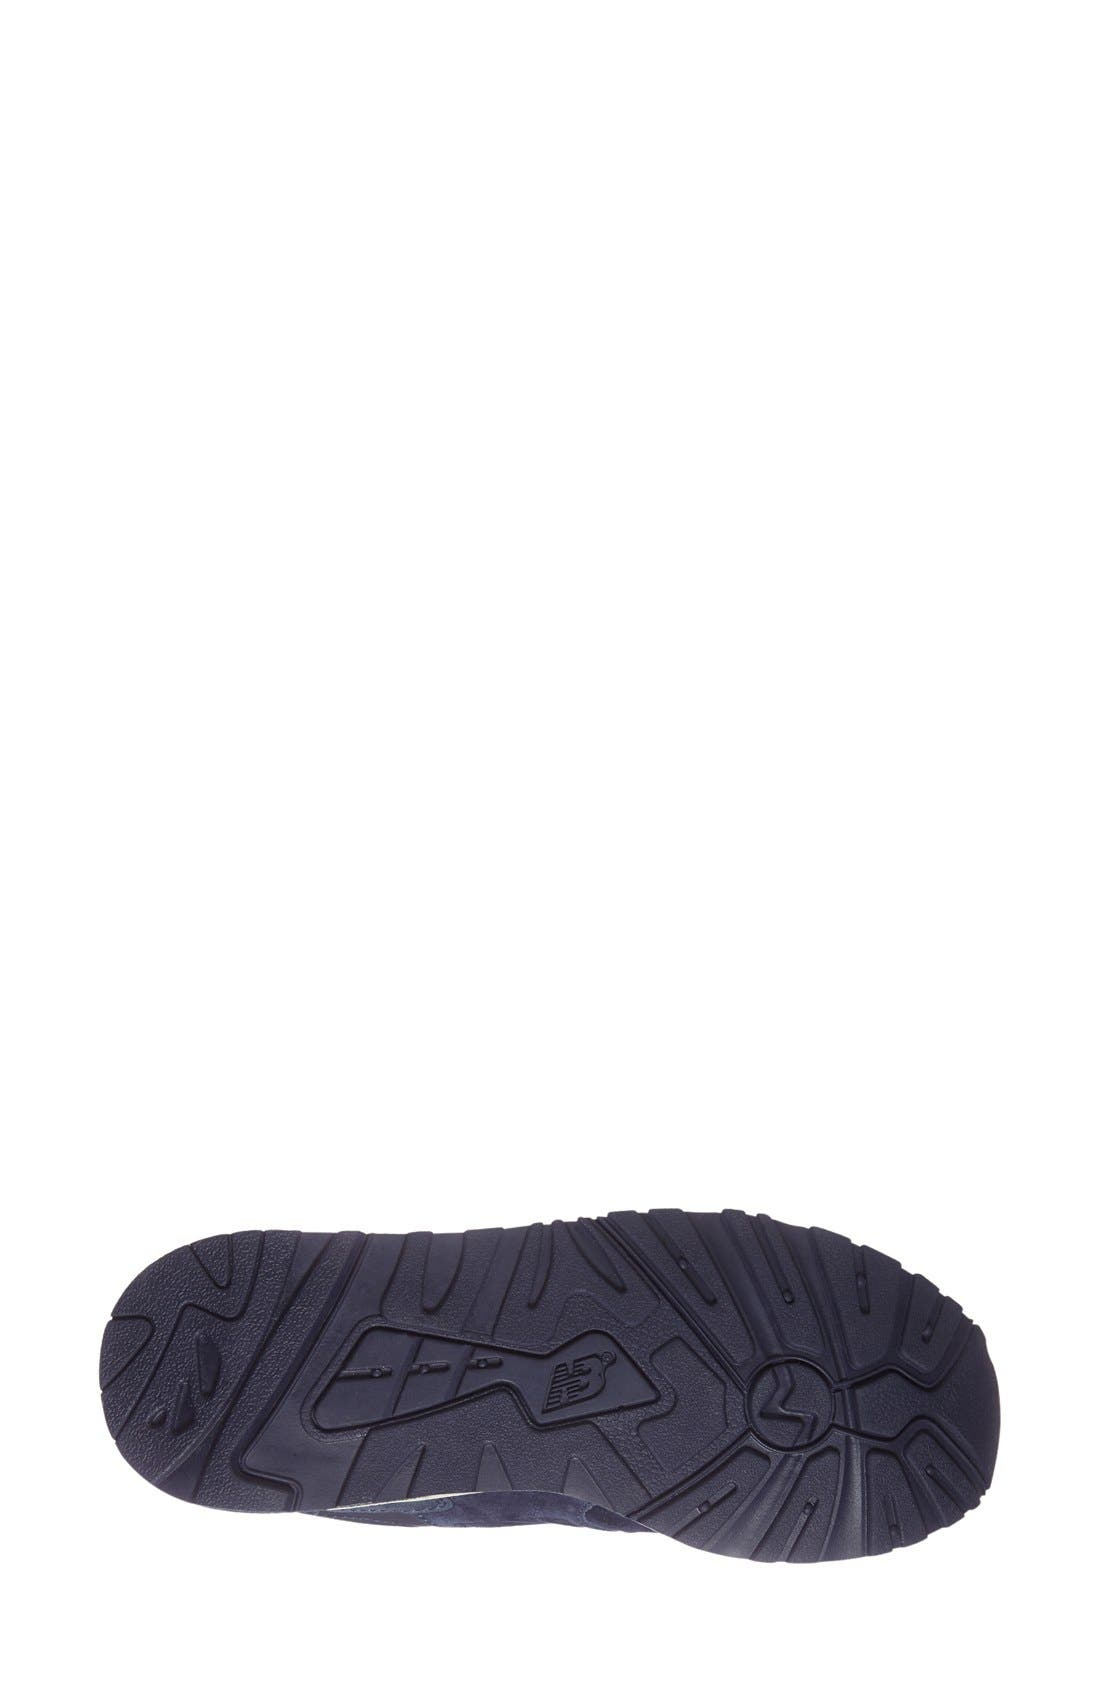 Alternate Image 3  - New Balance '999' Sneaker (Women)